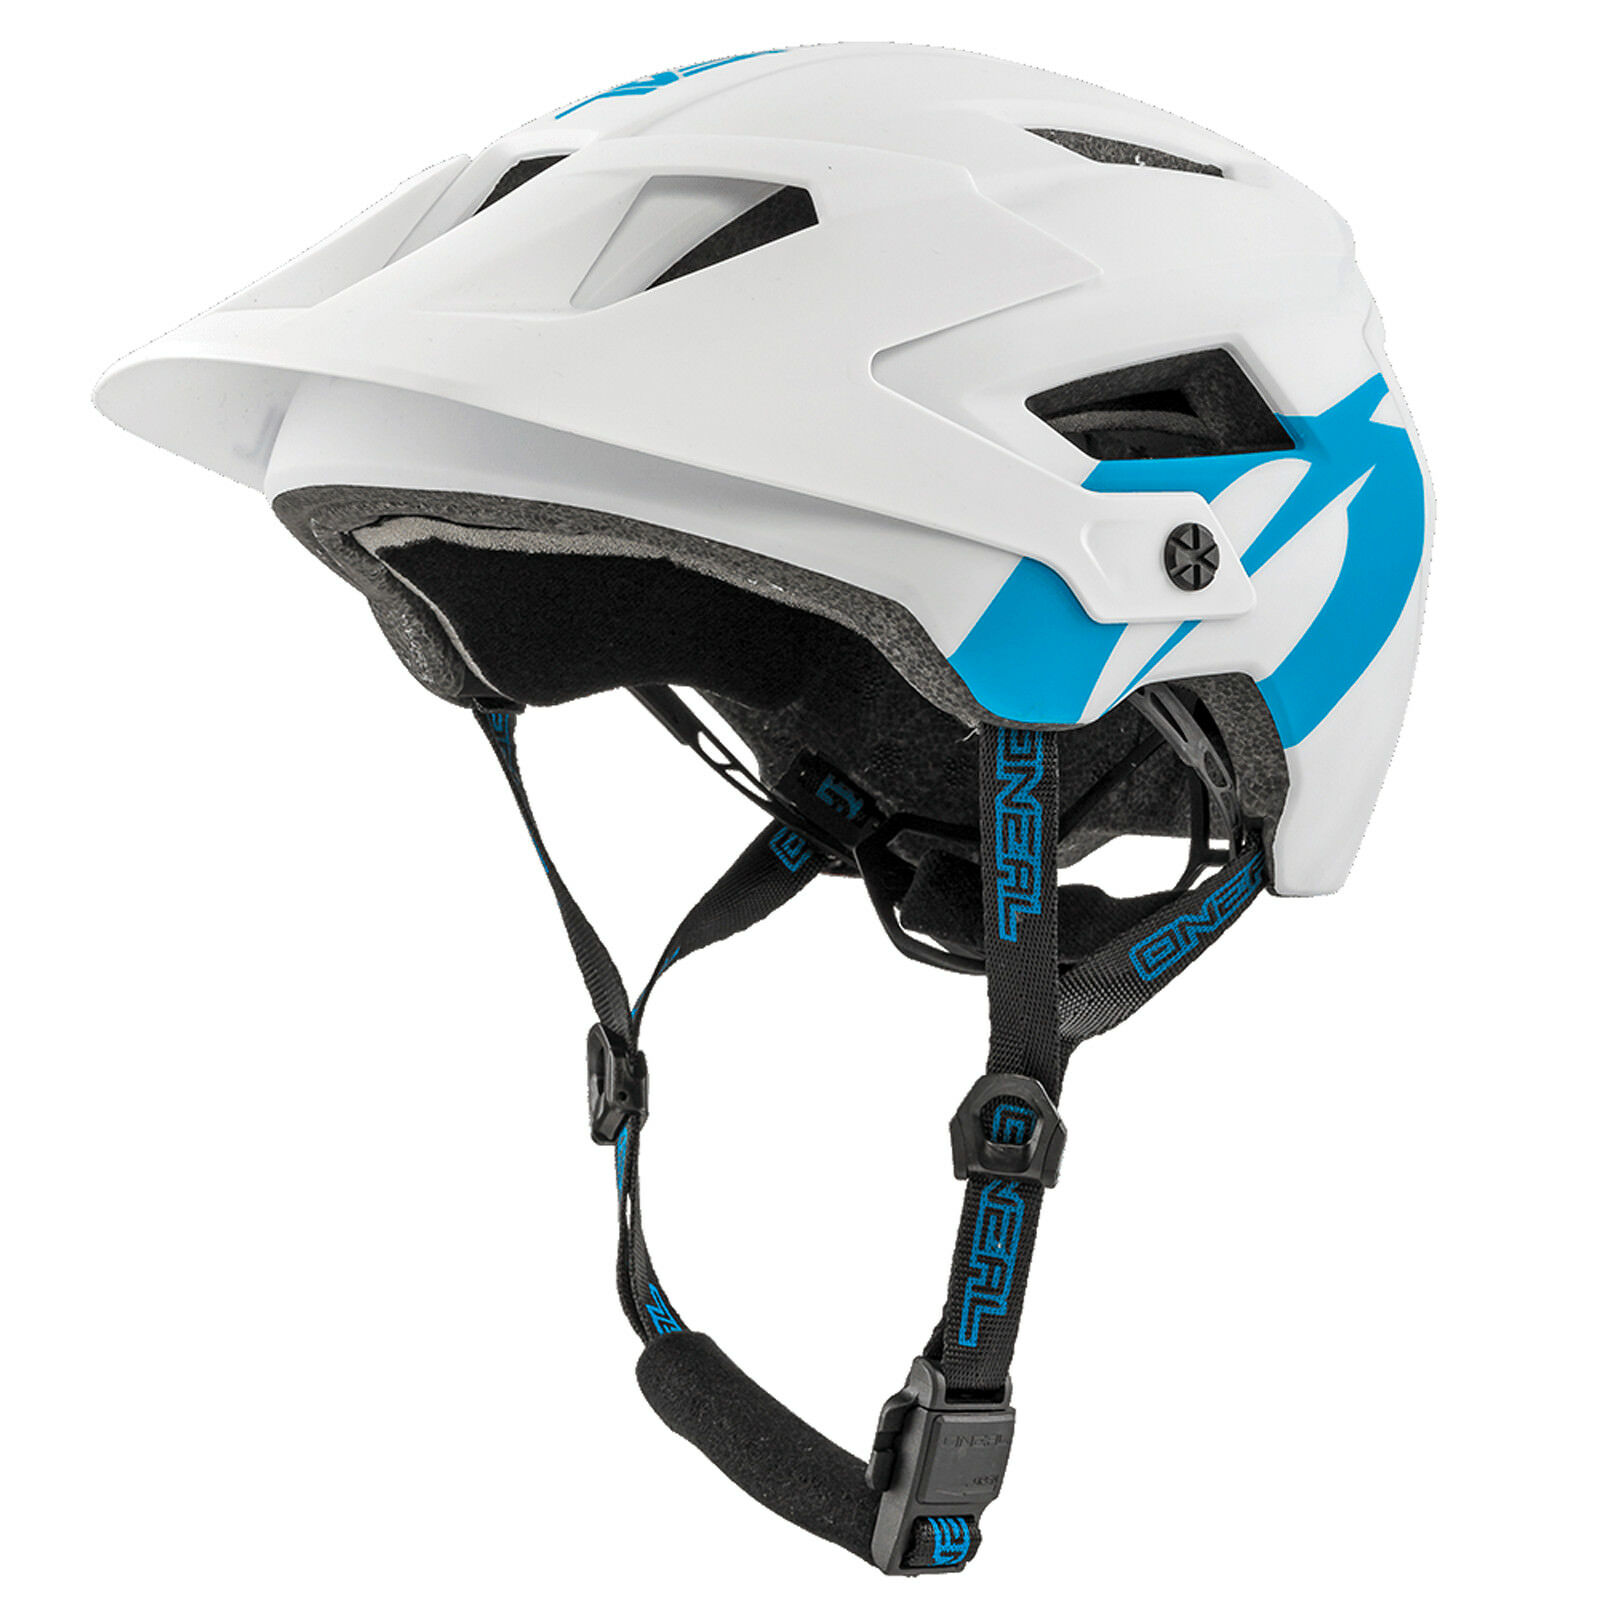 O 'neal defender 2.0 Solid All mountain MTB bicicleta casco blancoo azul 2019 oneal